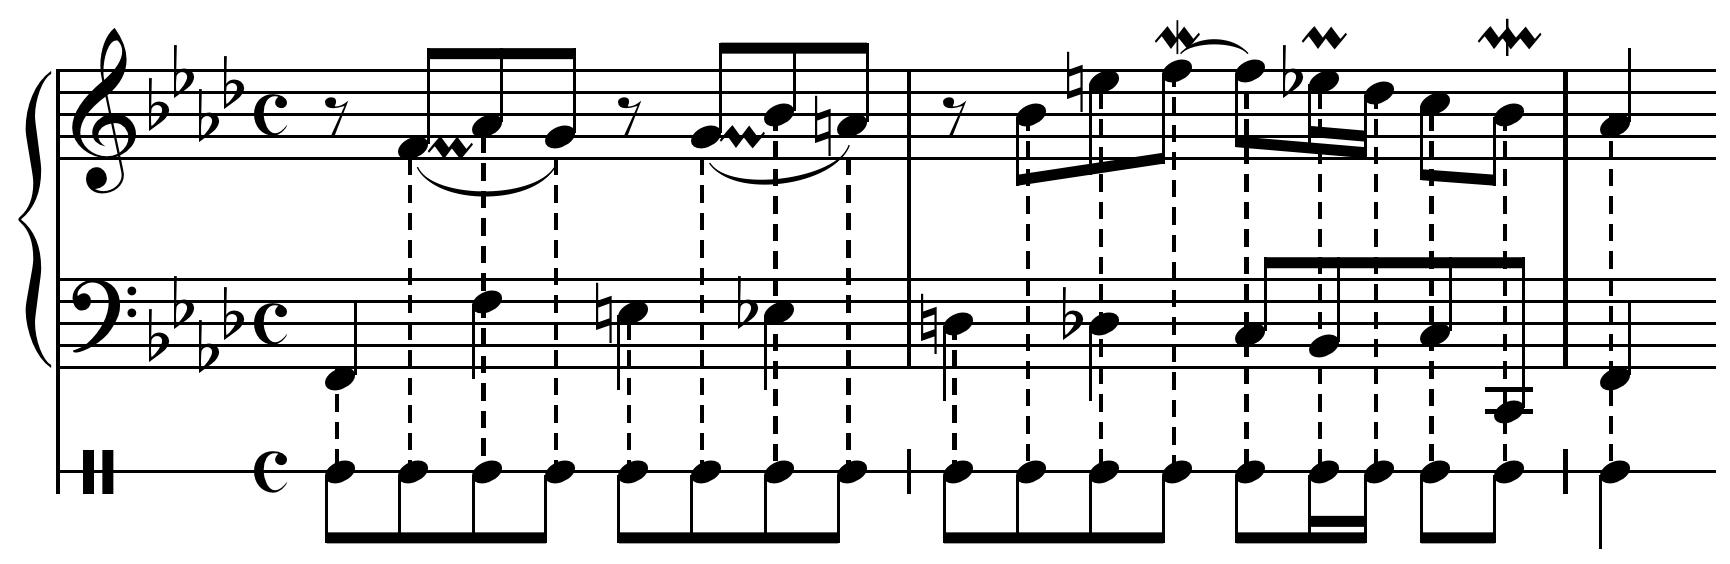 FileBach, Sinfonia in F minor BWV 20, mm. 20 20a composite rhythm ...